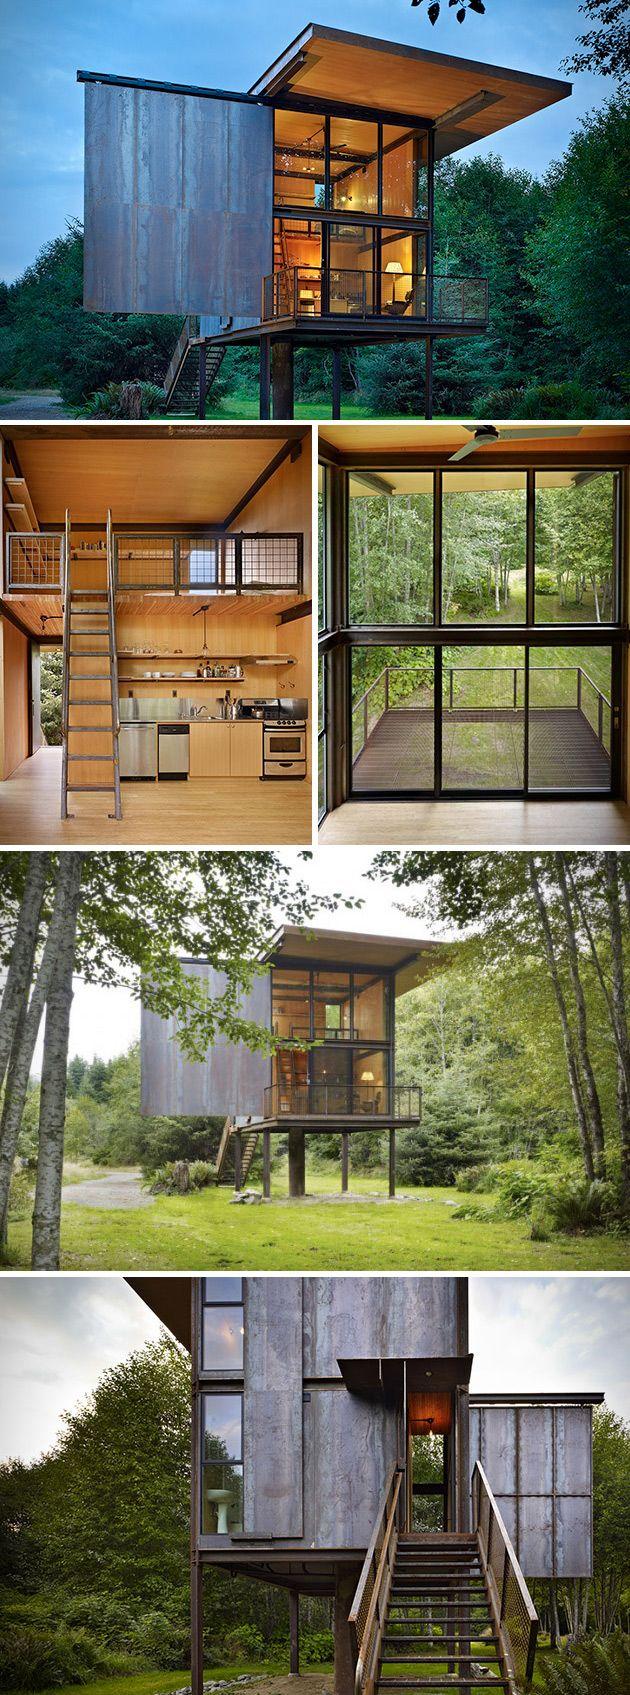 Garden Sheds At Home Depot sheds: nice tuff shed cabins for best shed inspirations